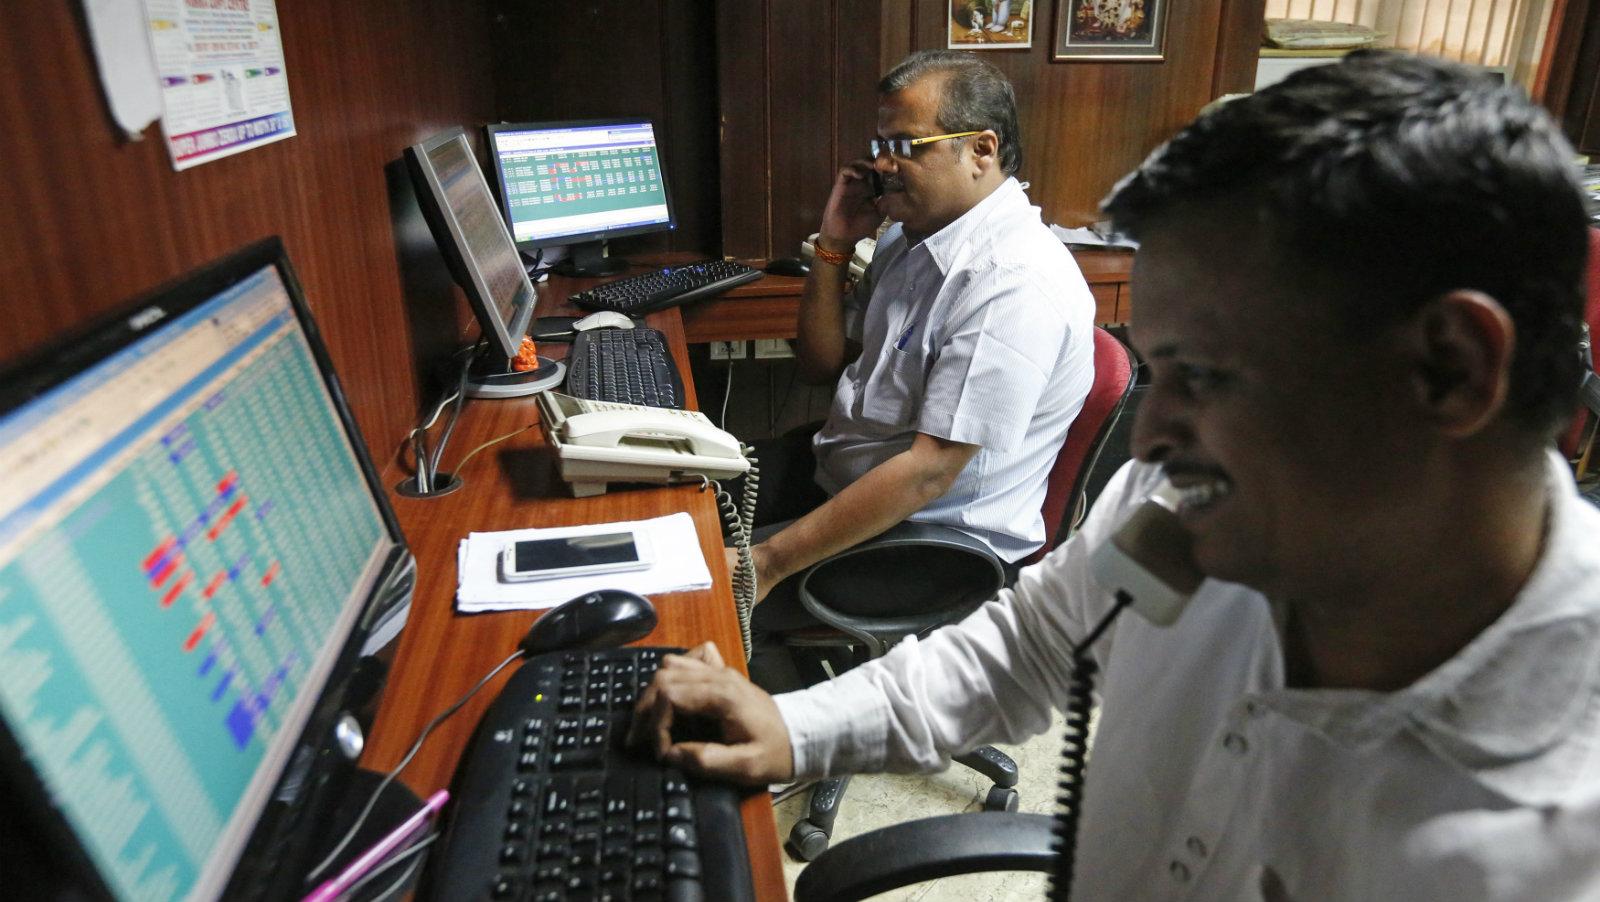 Brokers trade at their computer terminals at a stock brokerage firm in Mumbai